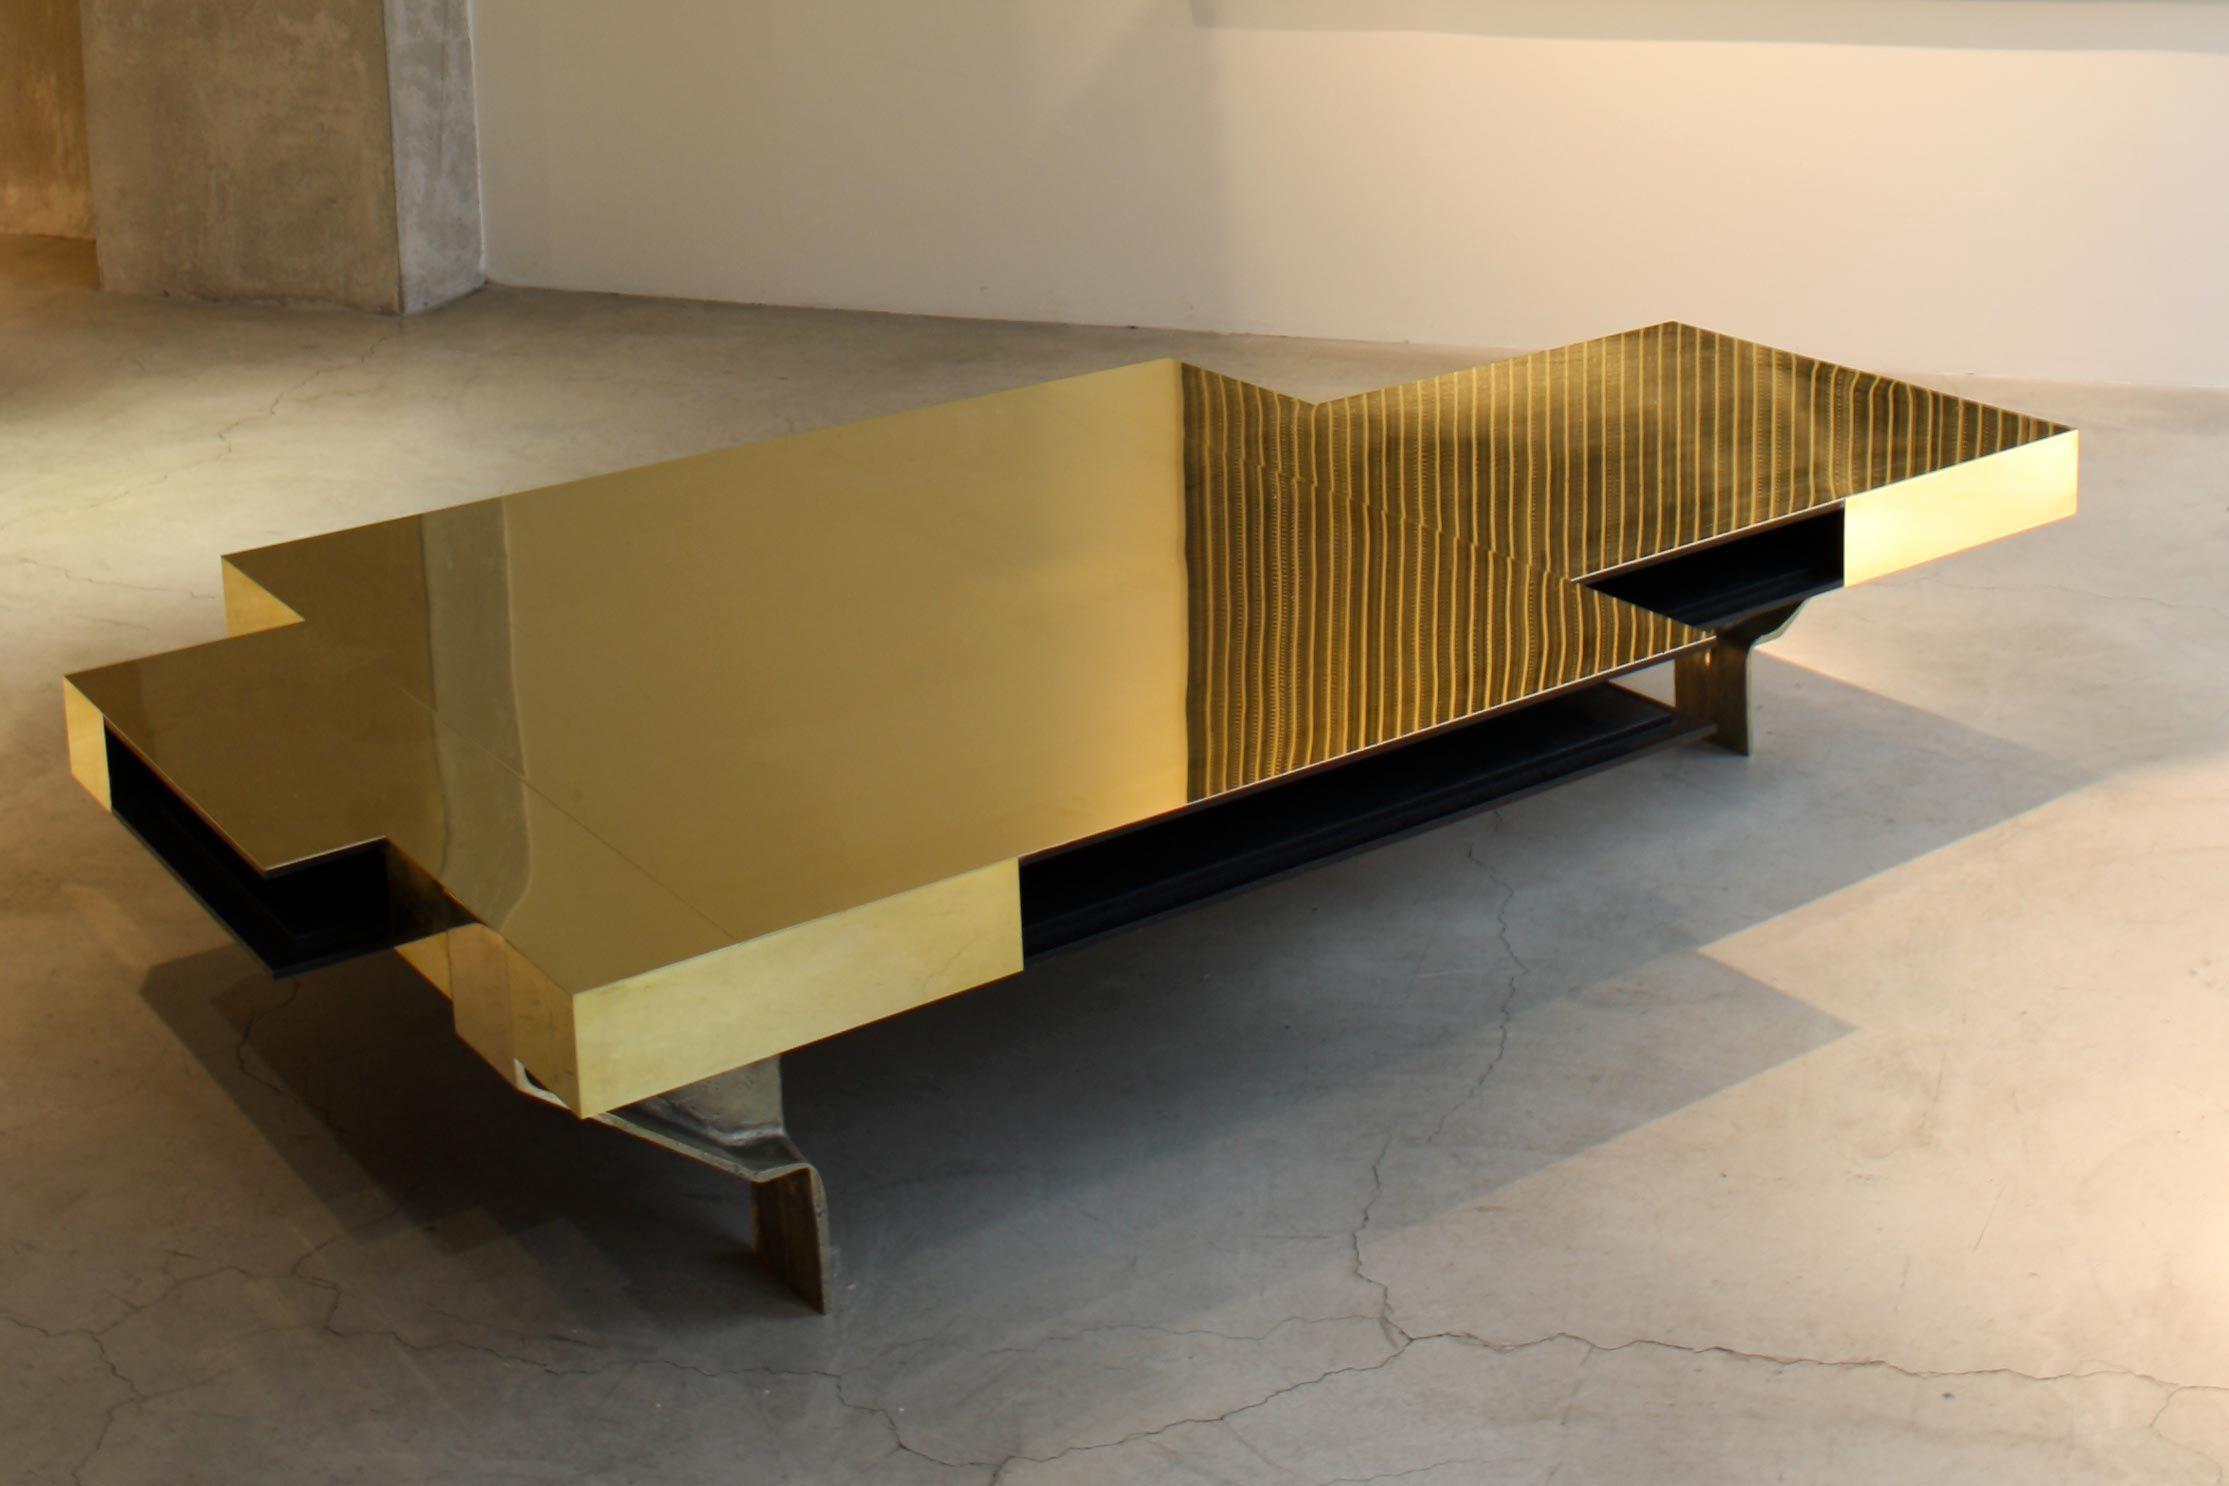 98811e764c92ef6f3e212c7ae8b43a3f Incroyable De Table Basse Le Corbusier Concept